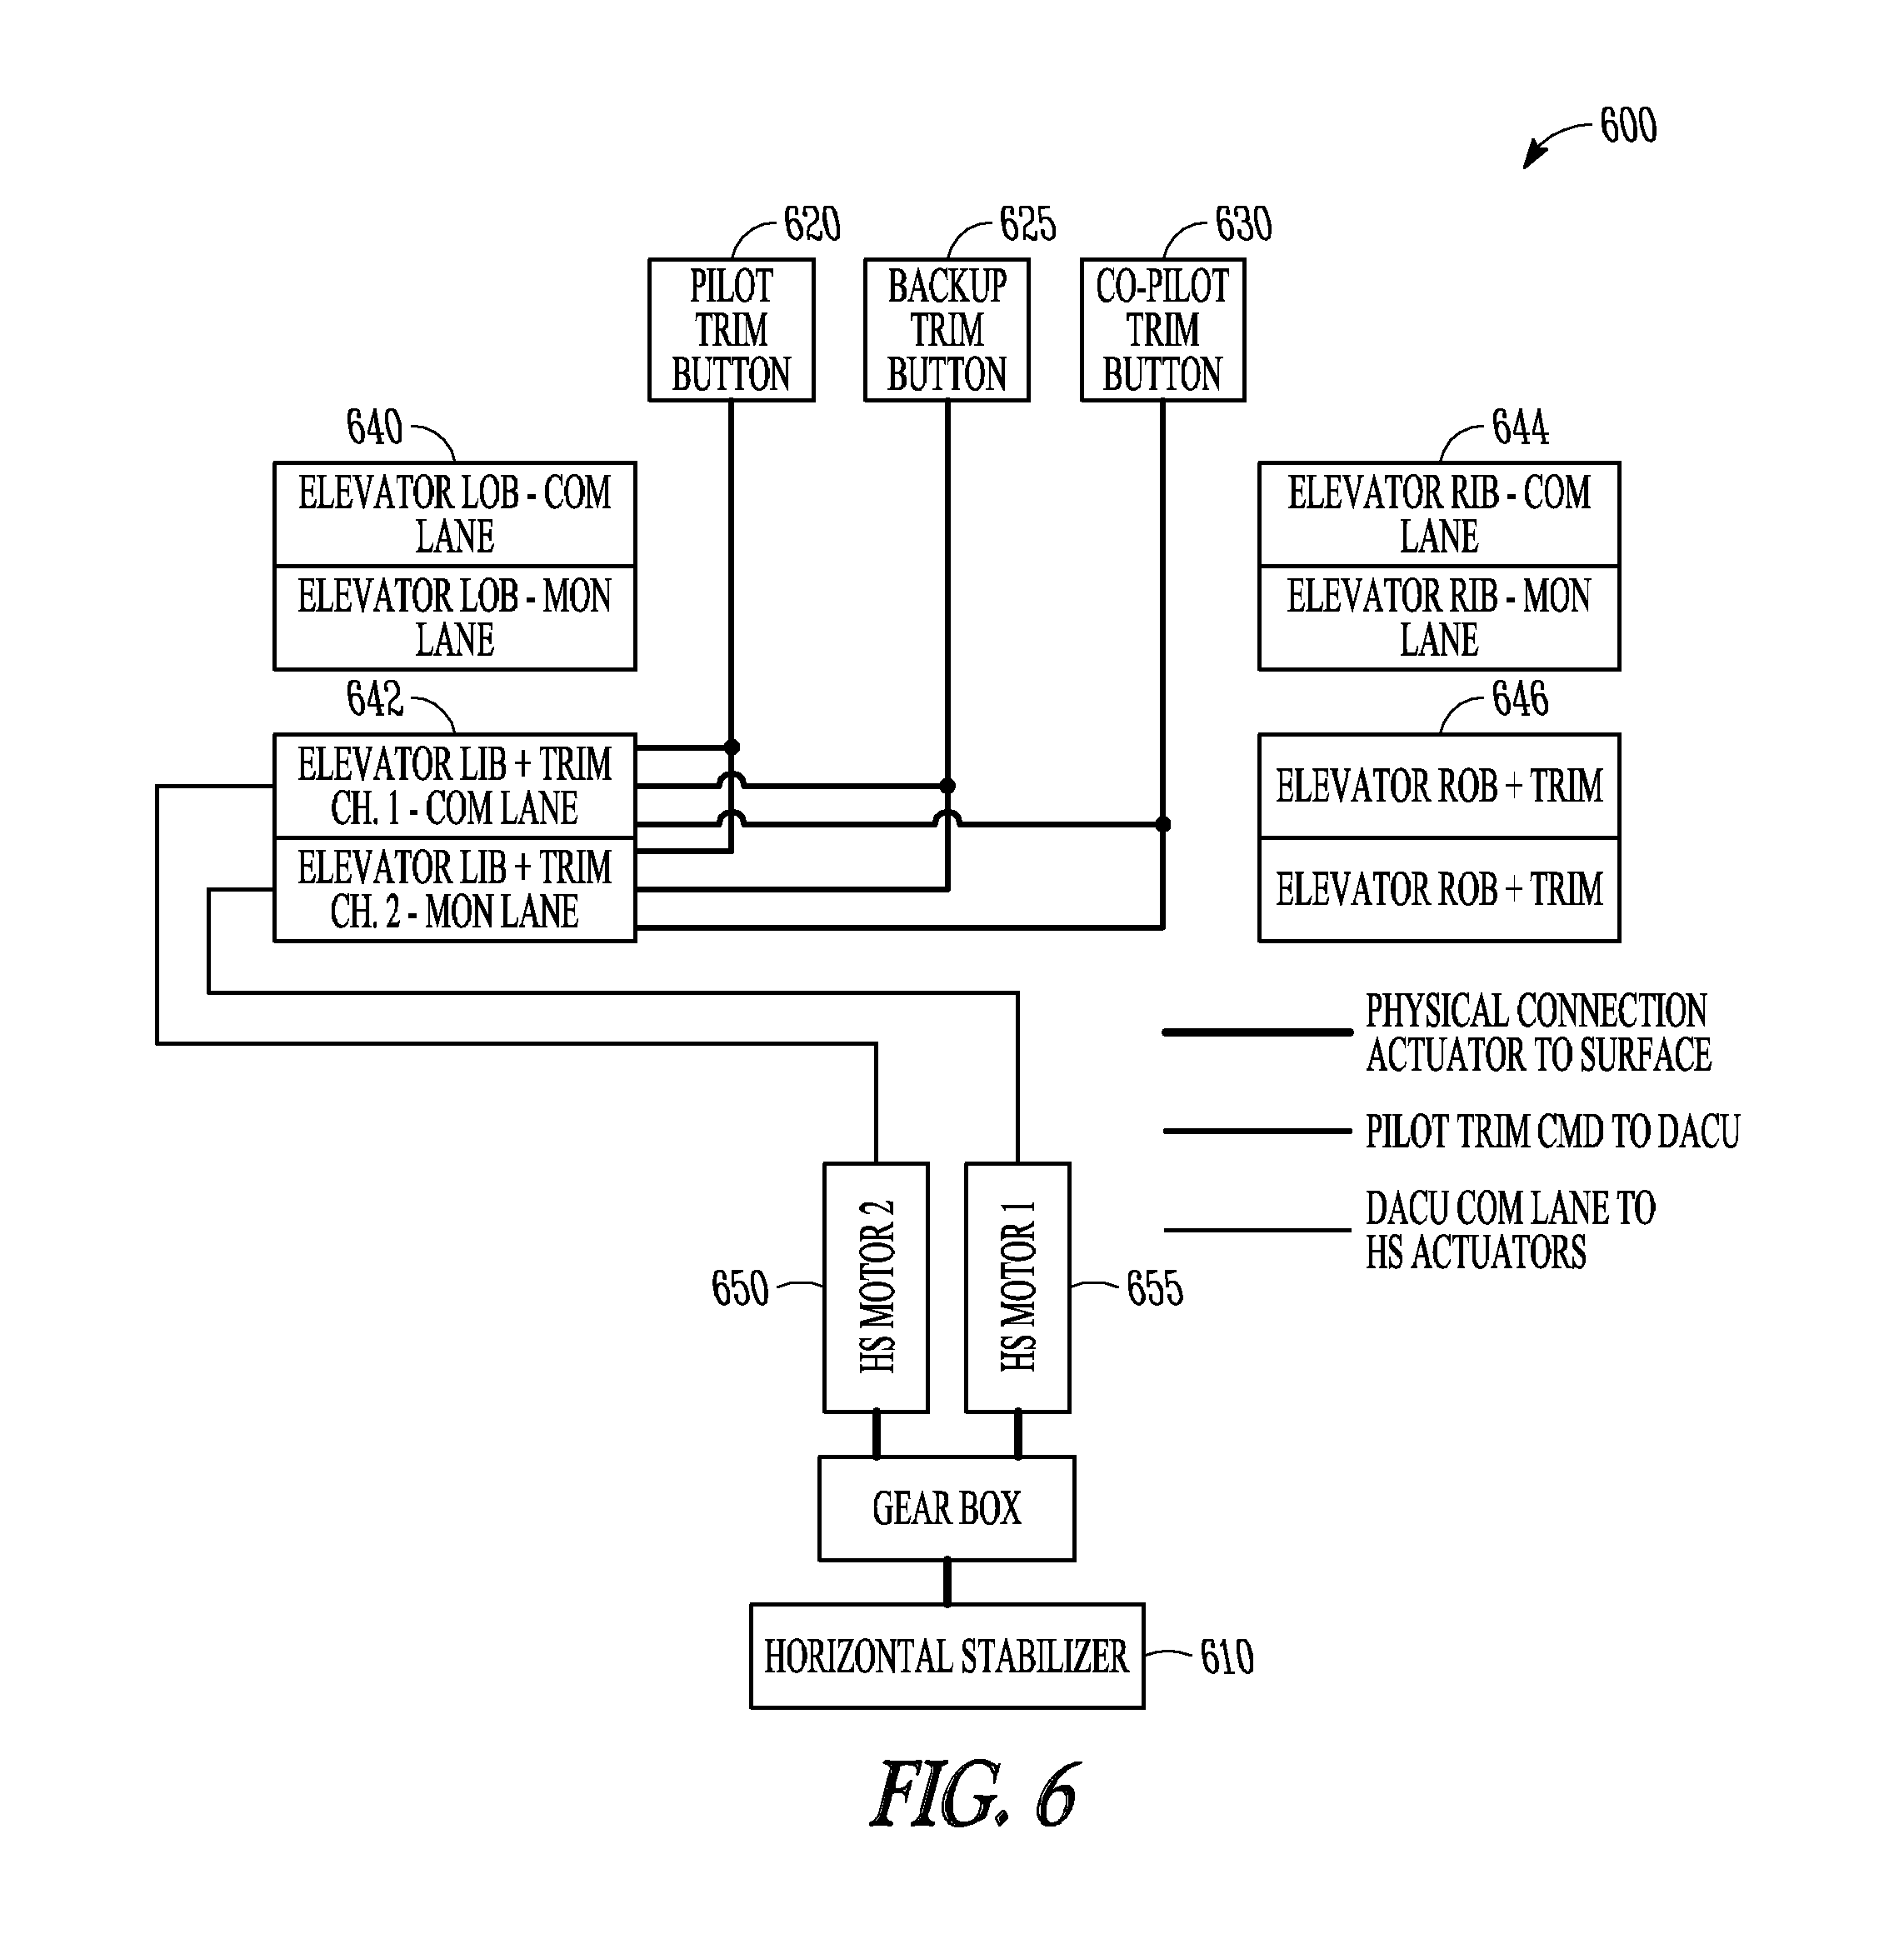 car amplifier wiring diagram audi a6 mini cooper amplifier Audi 2.8 Engine Diagram Audi 2.8 Engine Diagram